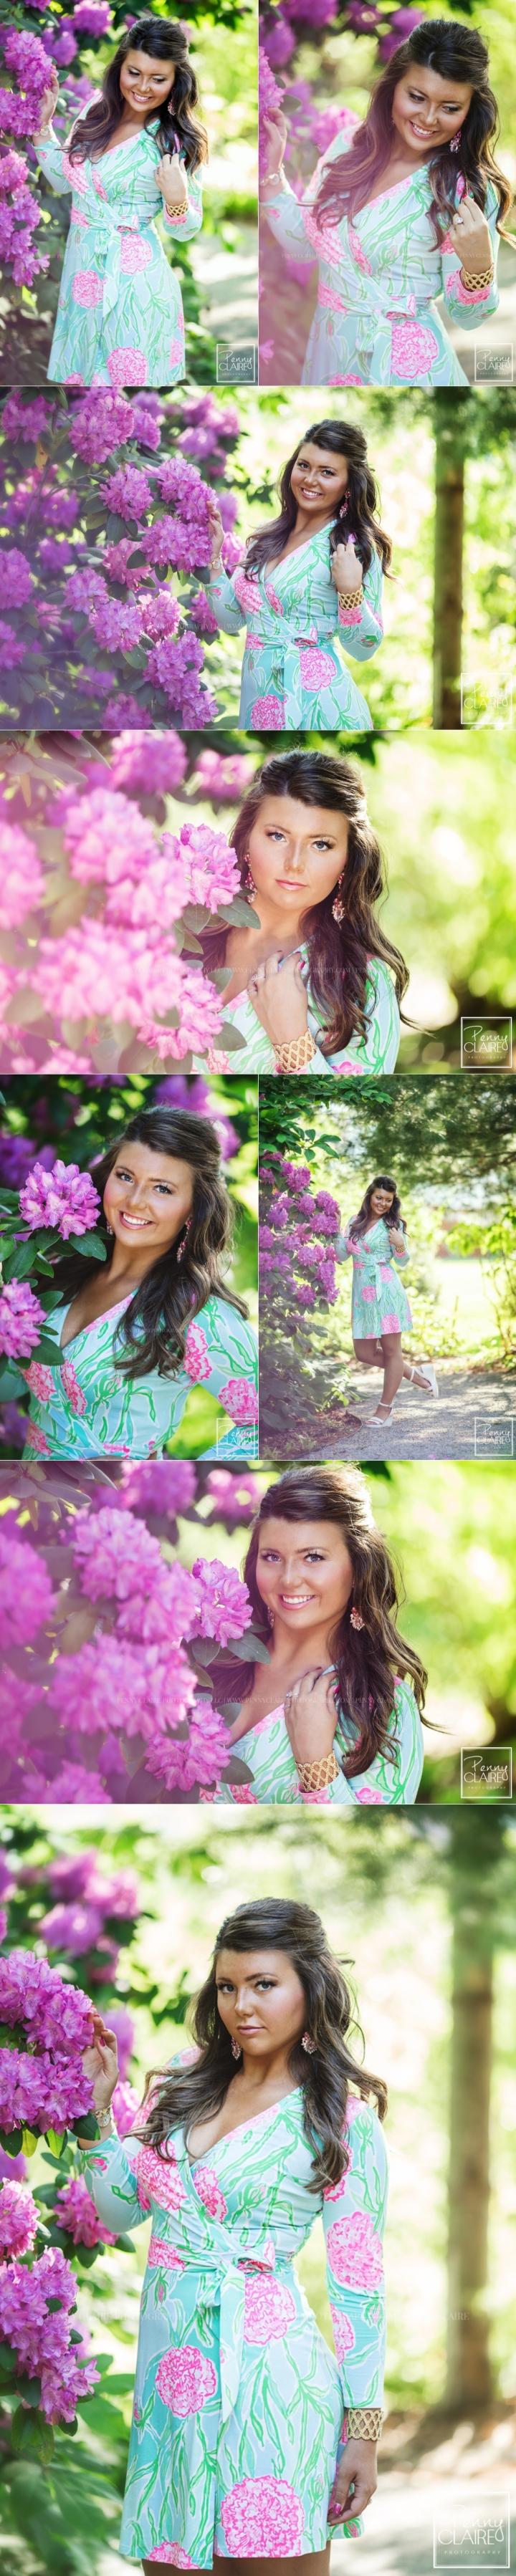 Glamour_Photography_Zanesville 1